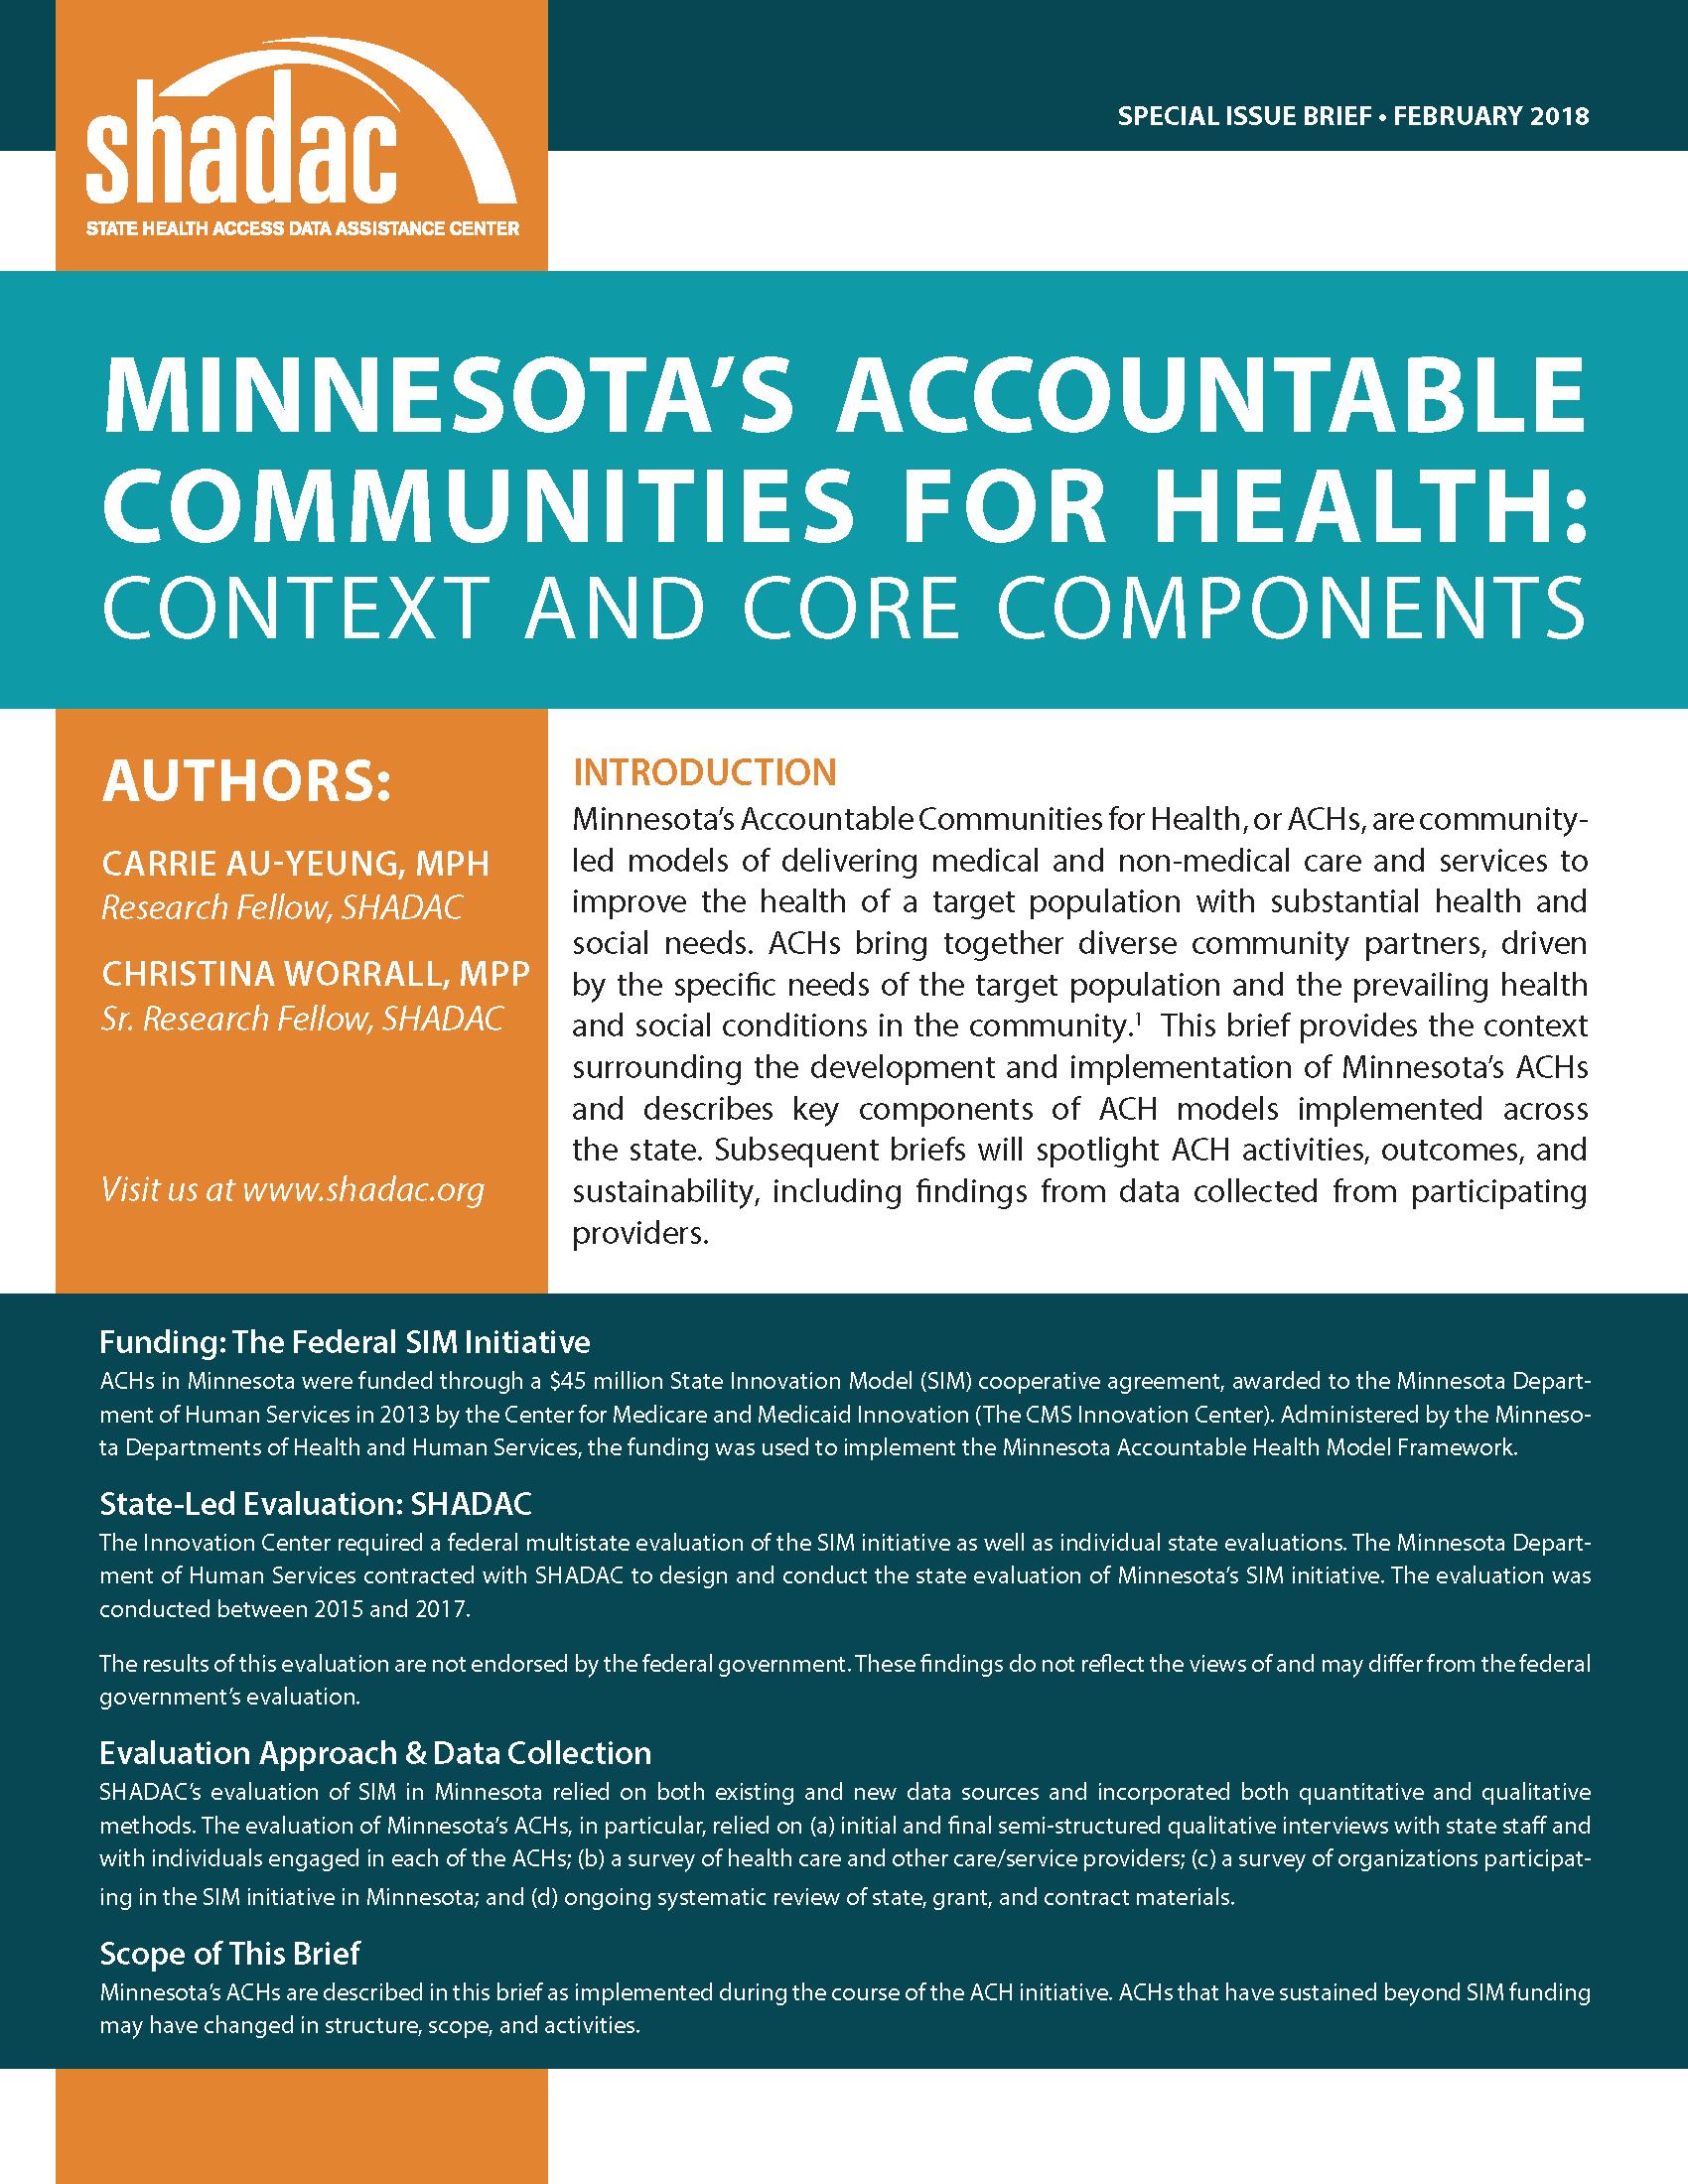 Shadac Brief Examines Minnesotas Accountable Communities For Health